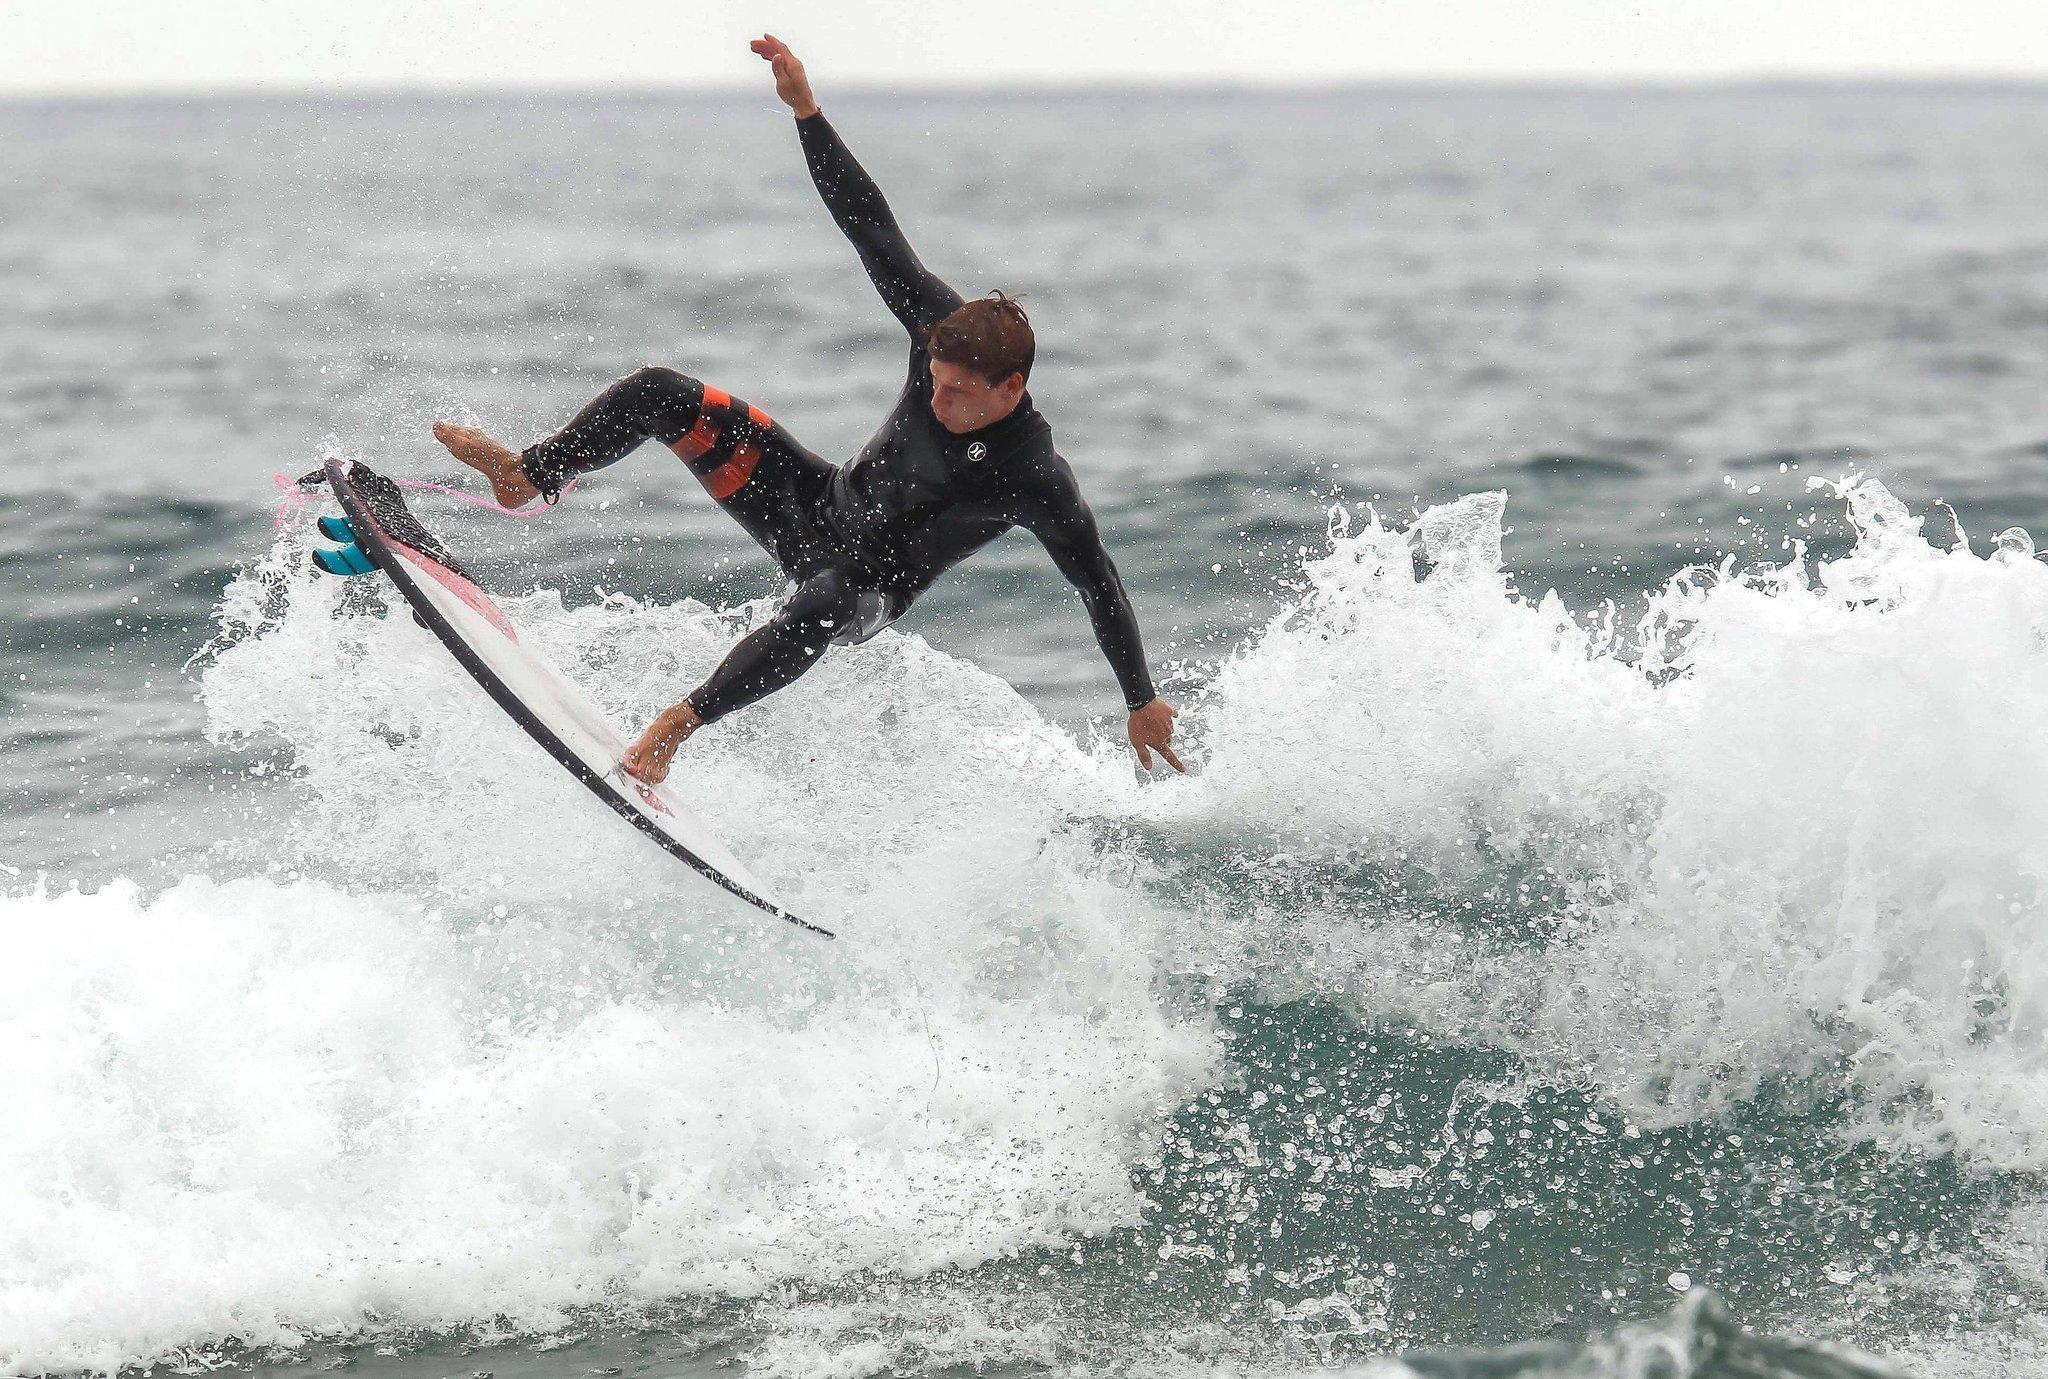 Team rides wave of success - The San Diego Union-Tribune